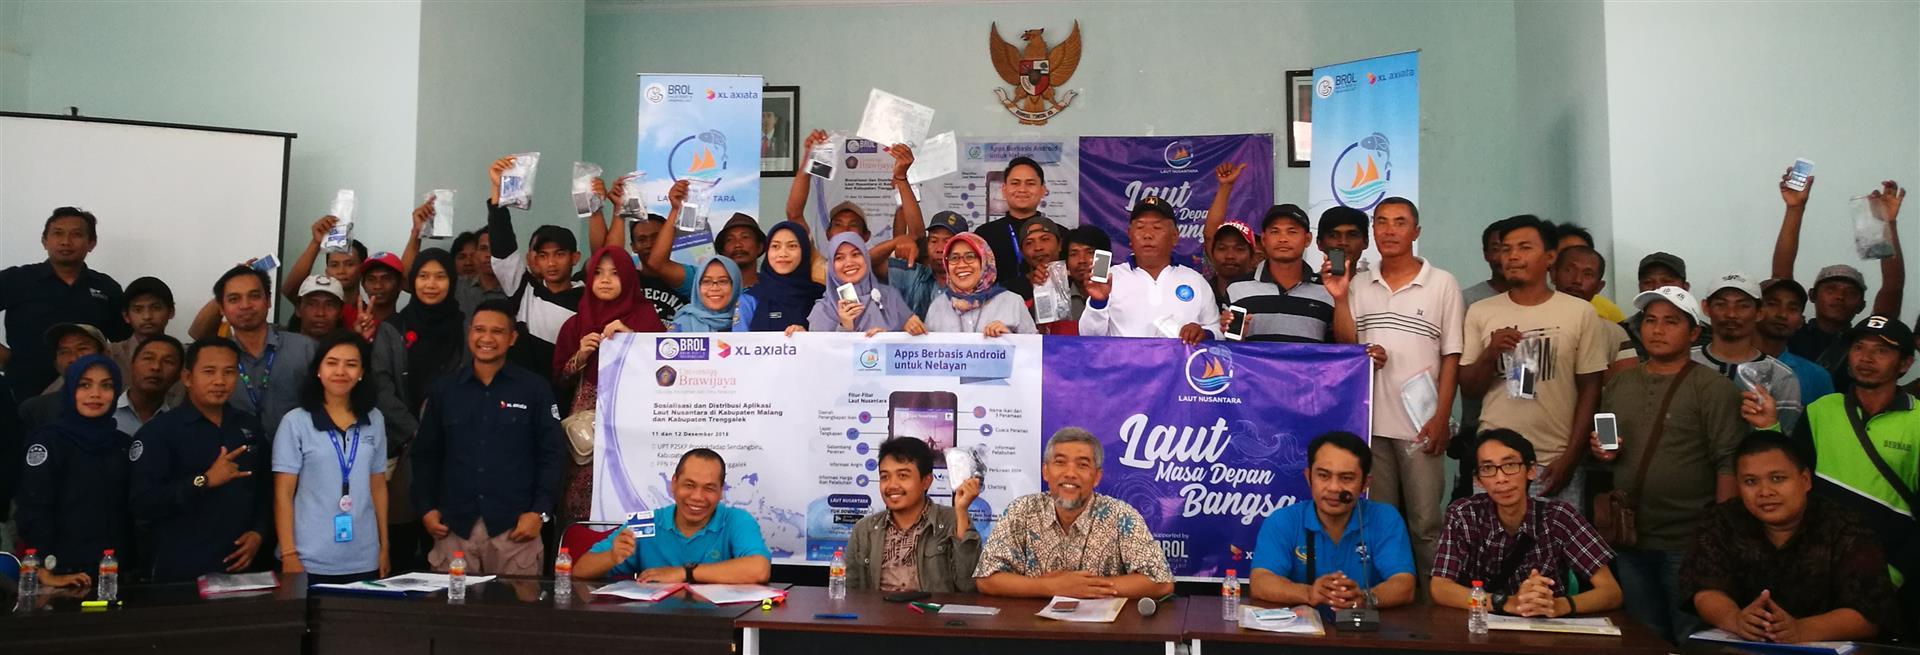 "Sosialisasi ""Laut Nusantara"", Aplikasi Maritim Berbasis Android untuk Nelayan"